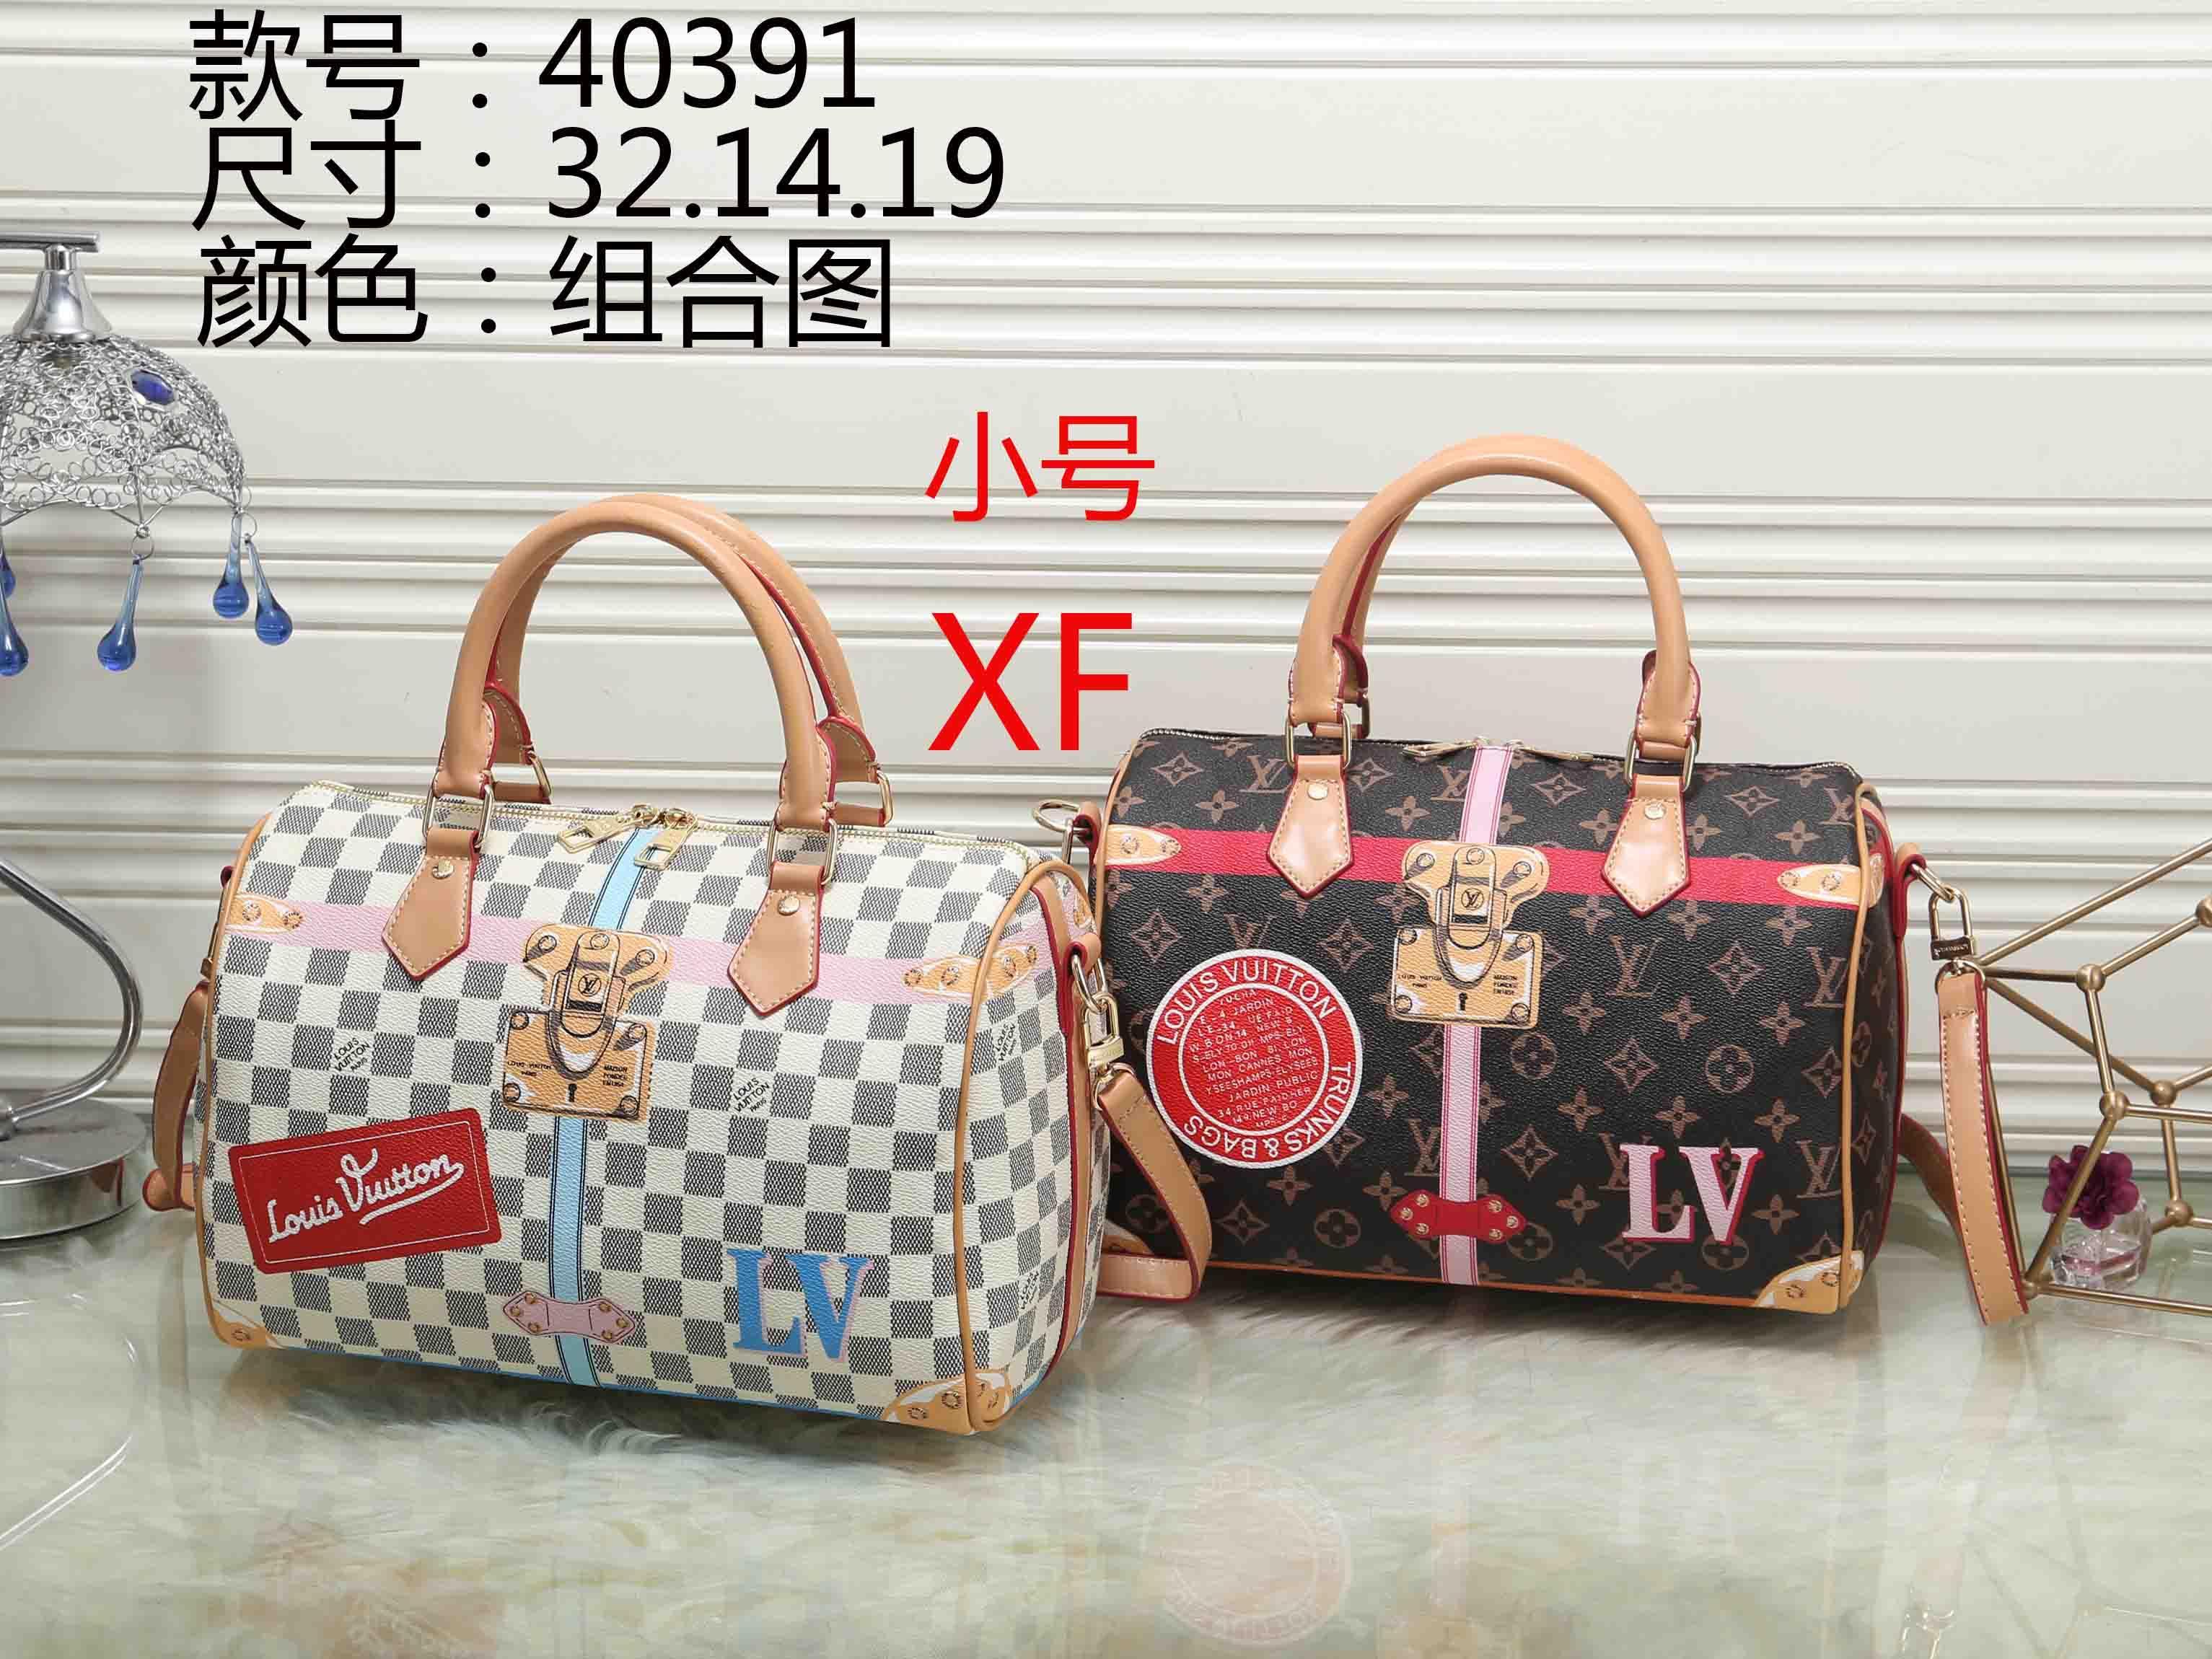 Women Handbag Waist Pack Ladies Designer Waist Pack Designer Handbag High  Quality Lady Clutch Purse Retro Shoulder Bag Handbags Wholesale Leather  Purse From ... 4b0cfff0d130d